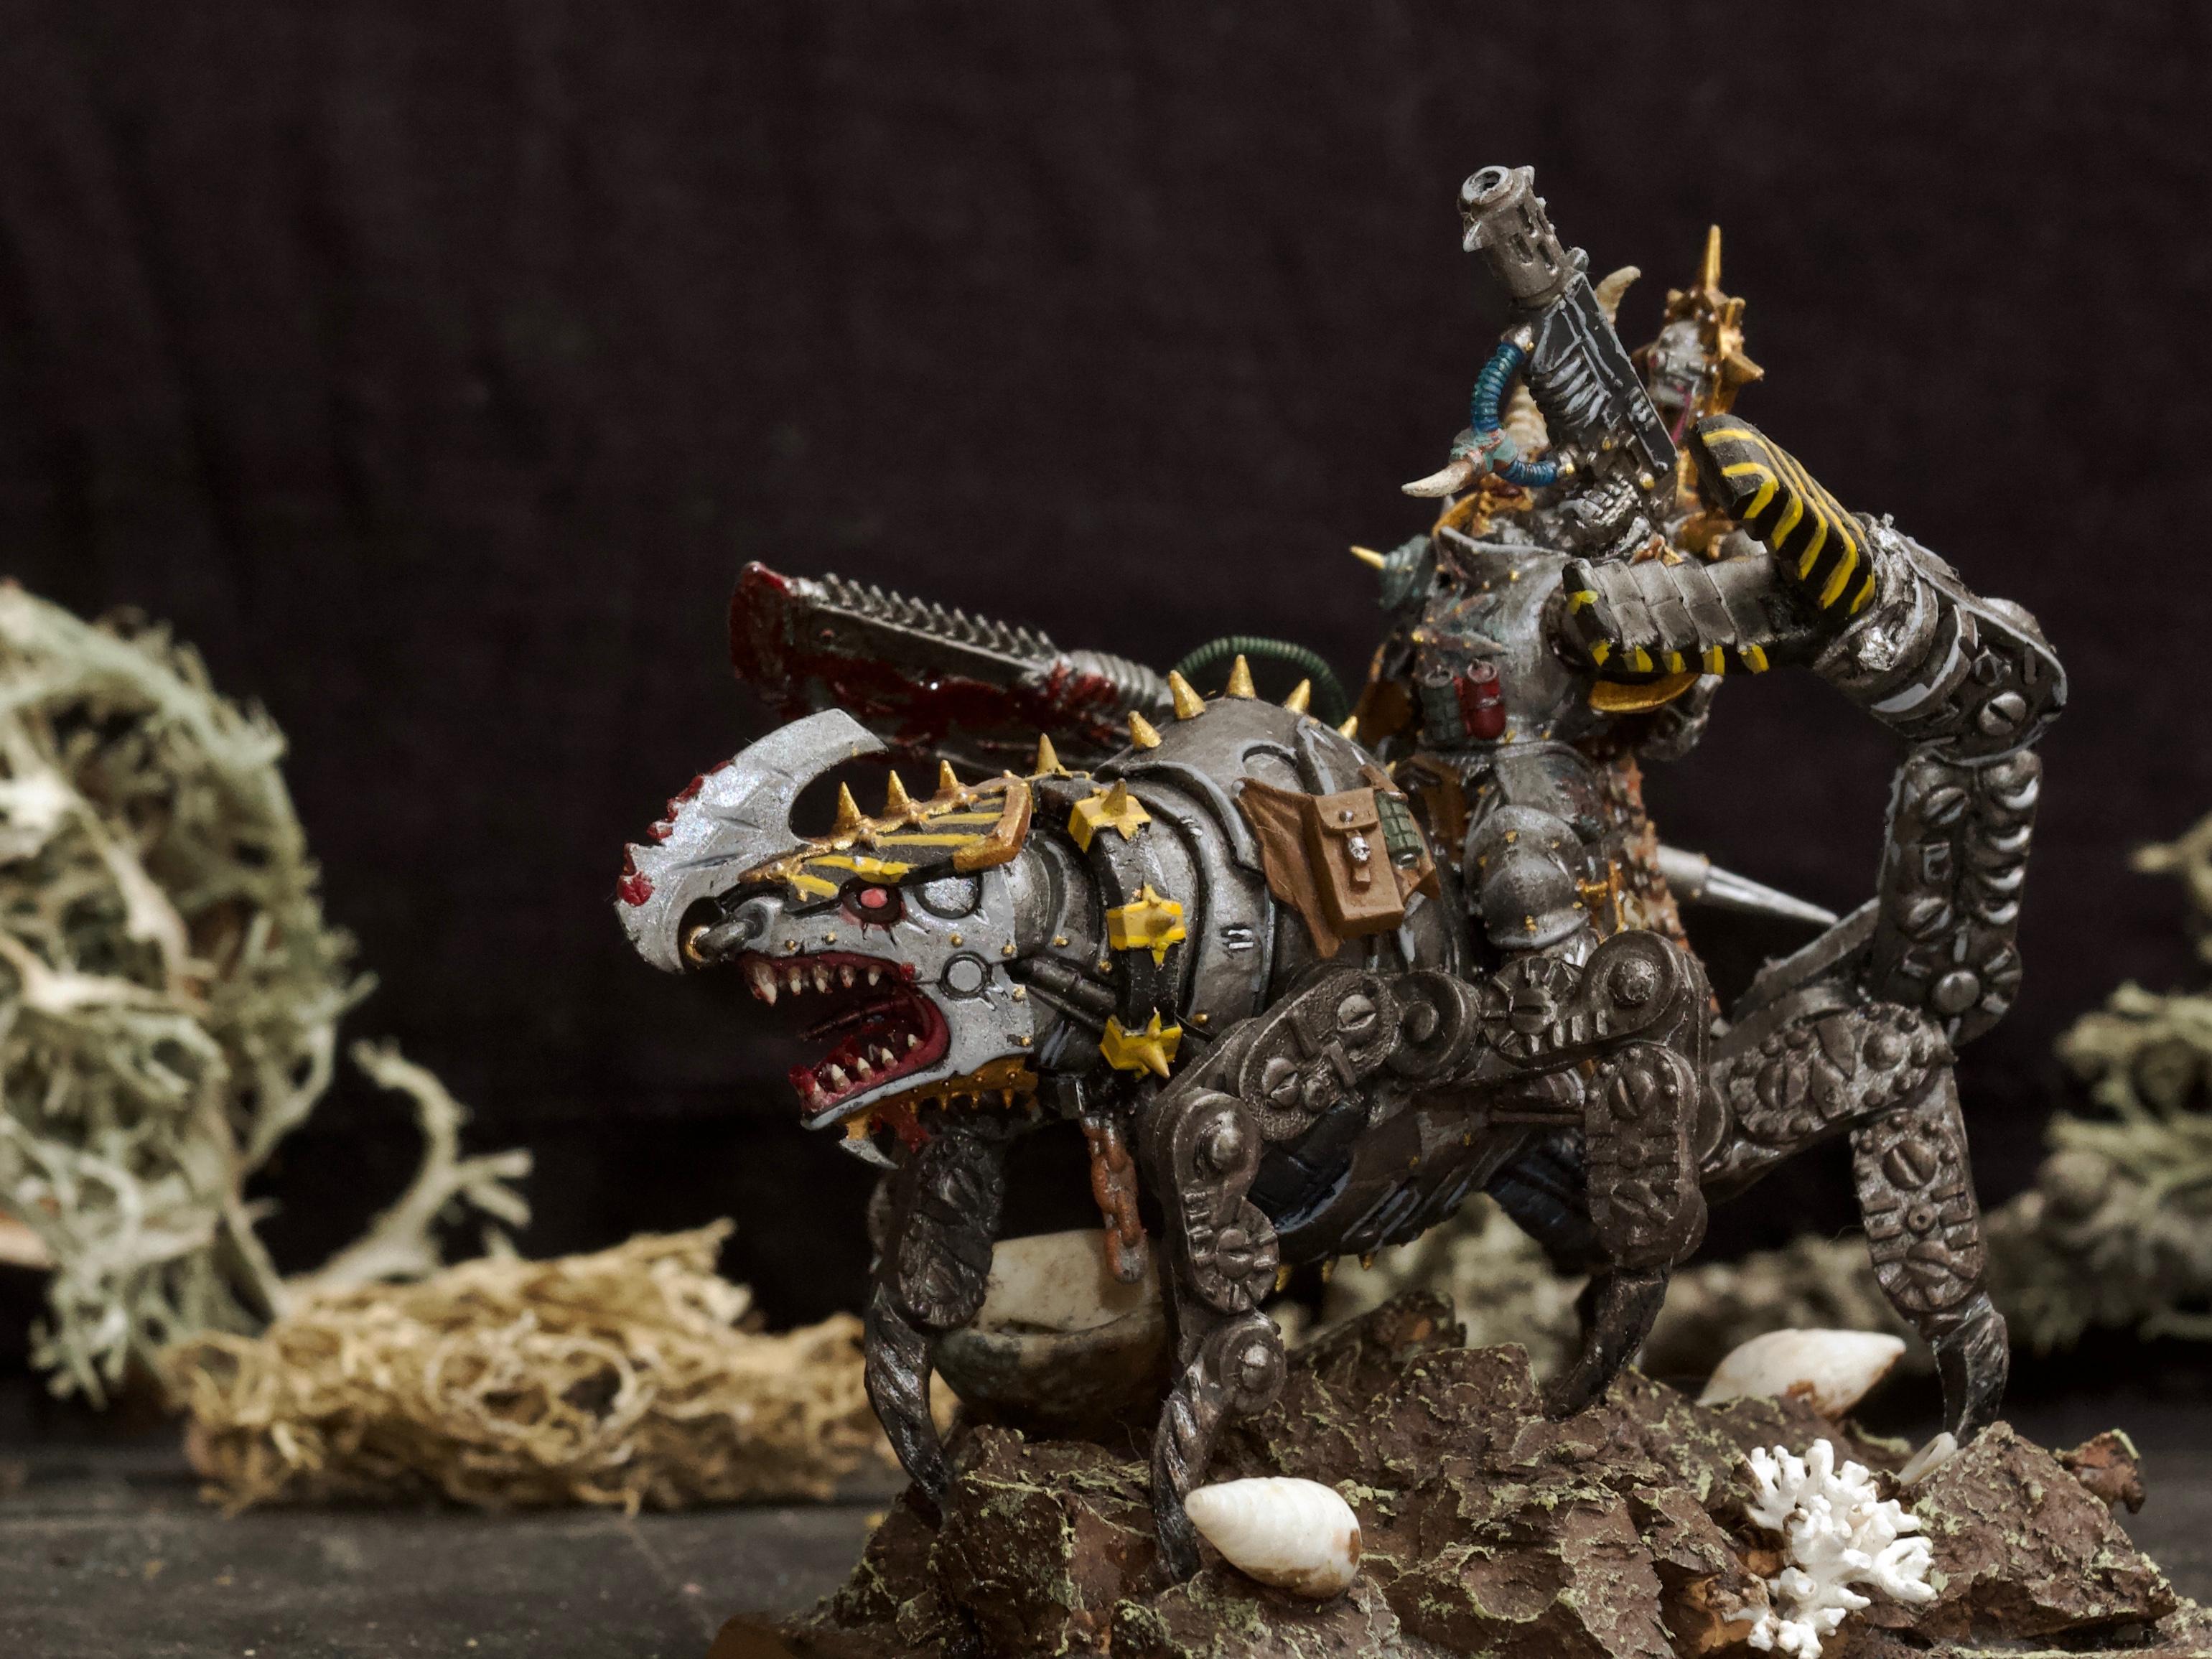 Awesome Photos, By Andrey Mishuta, Chaos, Chaos Space Marines, Conversion, Halberd, Hazard Stripe, Heretic Astartes, Iron Warriors, Juggernaut, Kitbash, M.a.k., Meltagun, Rider, Scratch Build, Warhammer 40,000